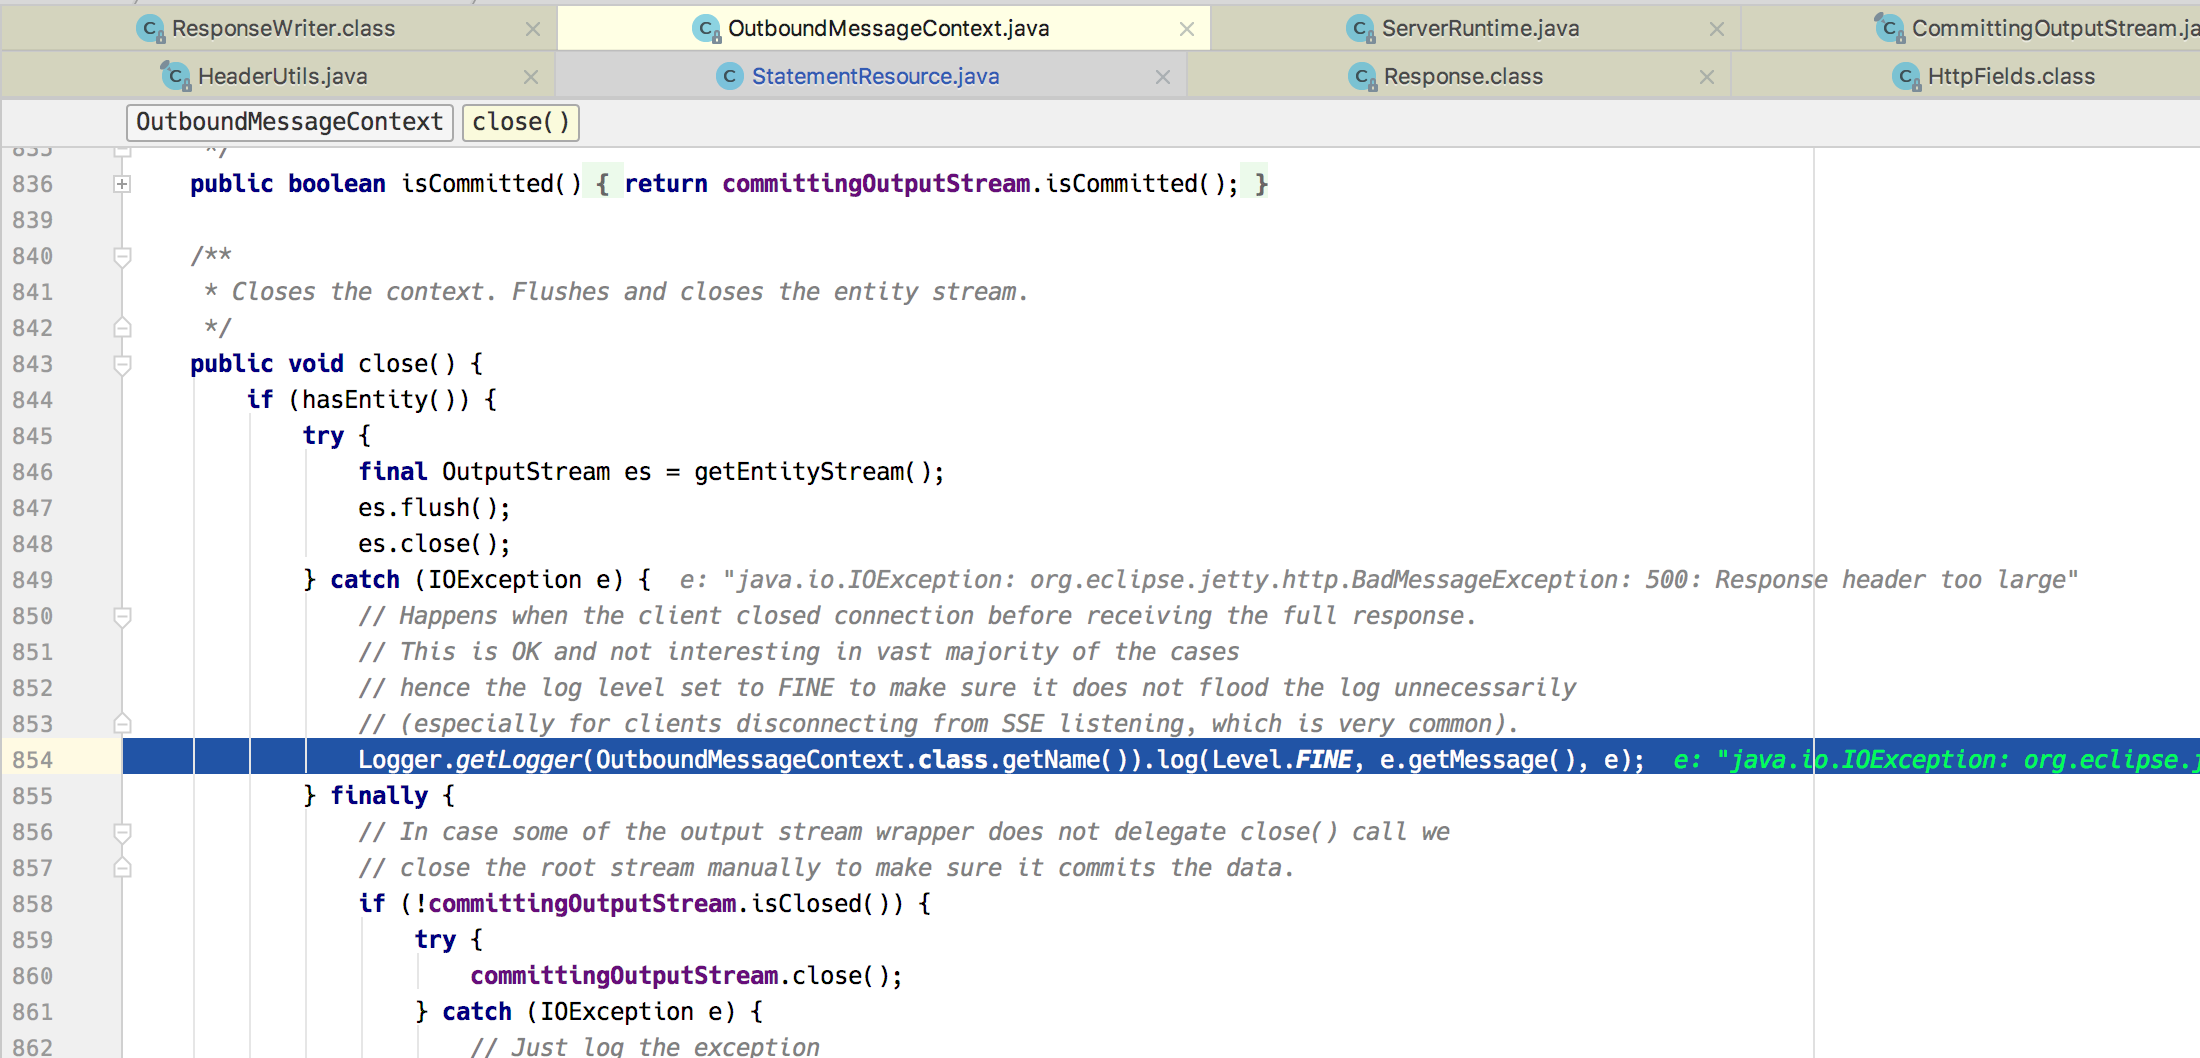 java.lang.runtimeexception failed http error code 200